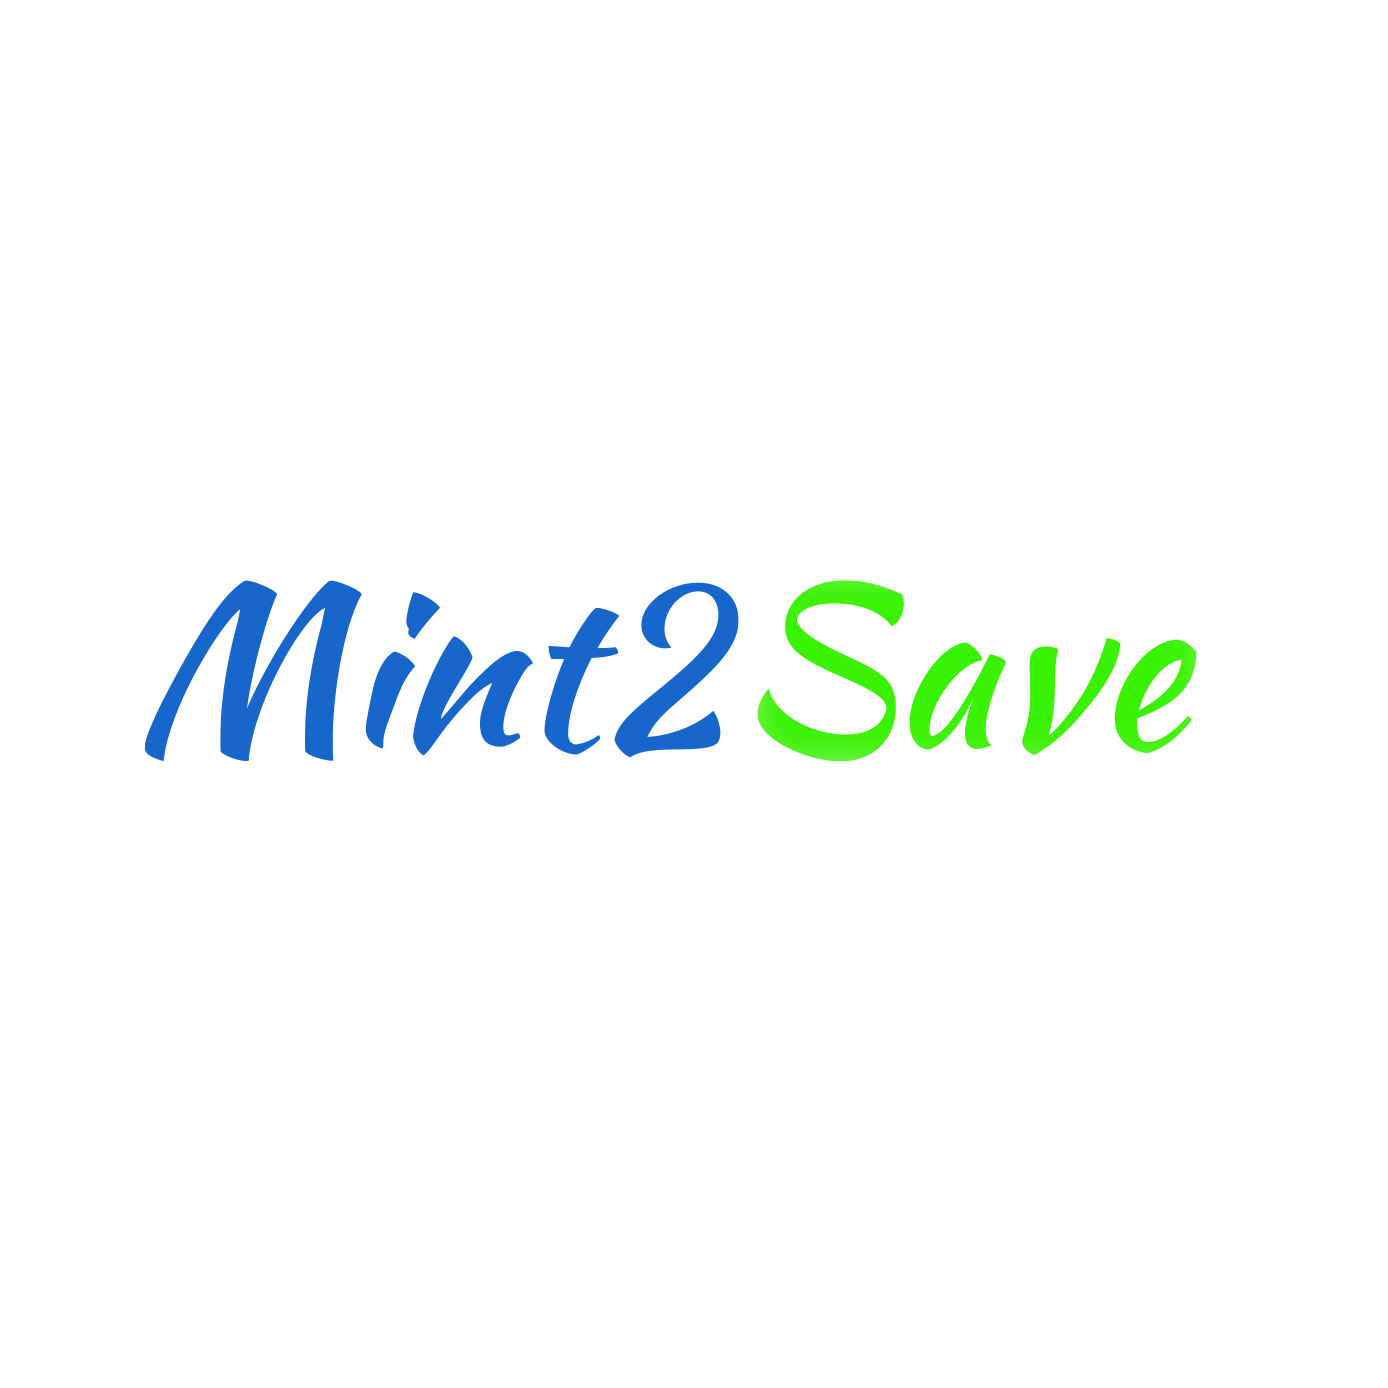 Mint2Save